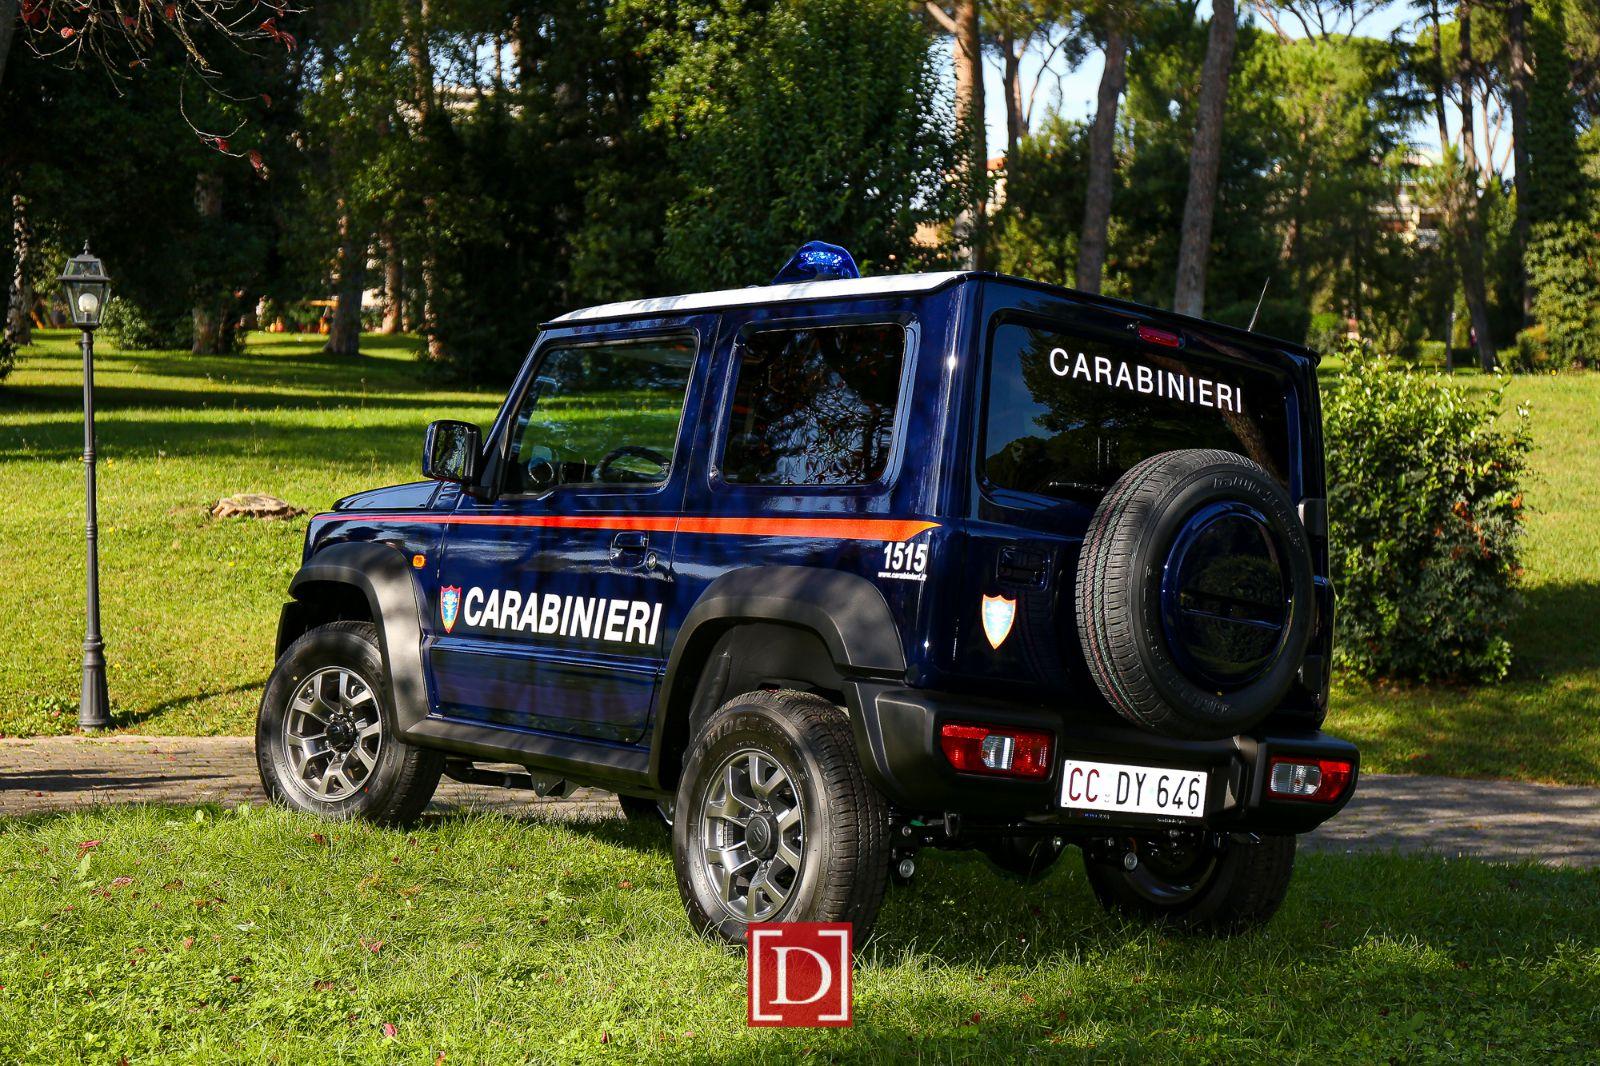 2019-10-23-suzuki-carabinieri-9124